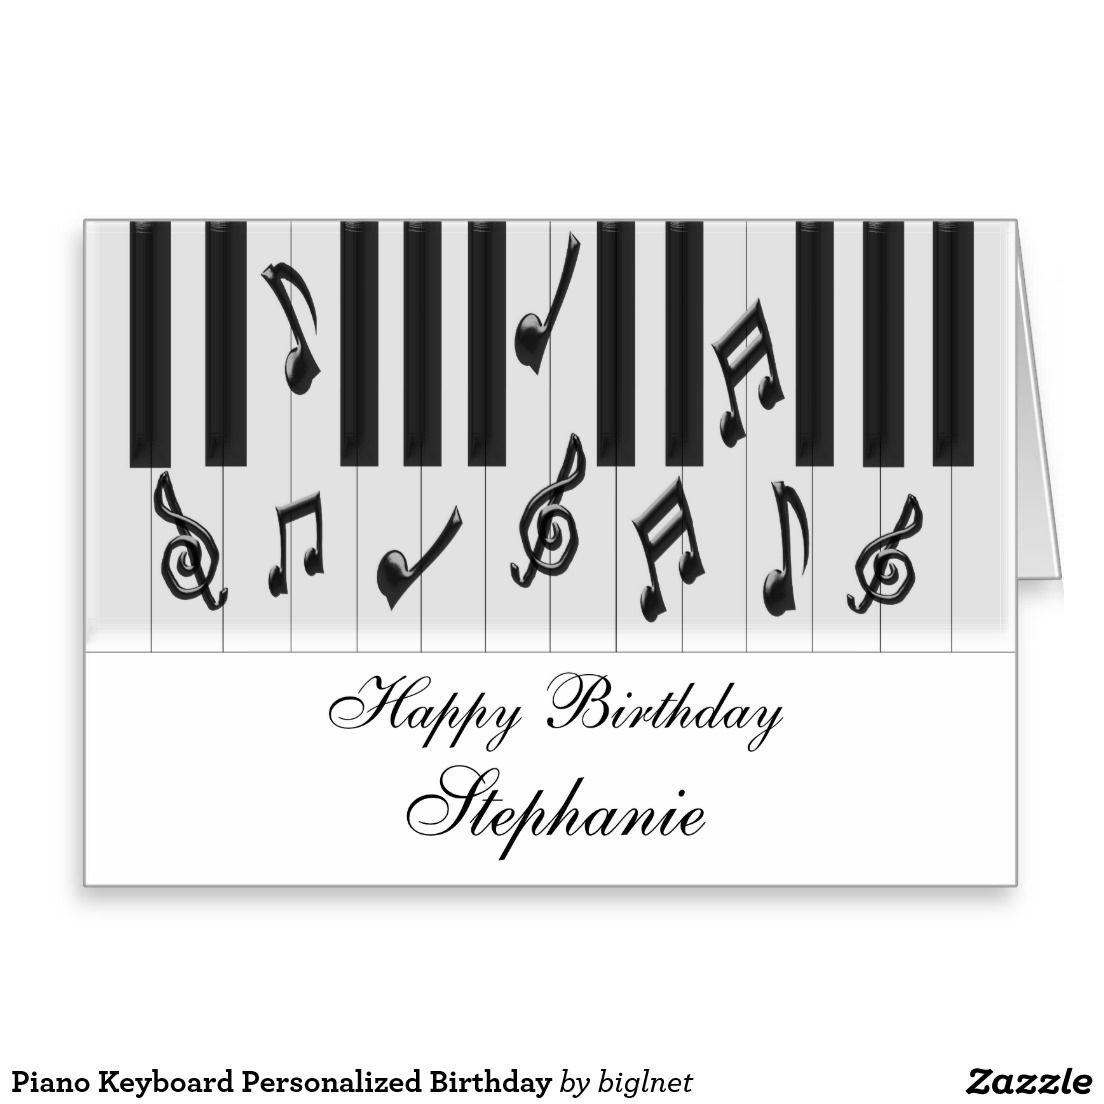 Piano Keyboard Personalized Birthday Card Birthday Cards